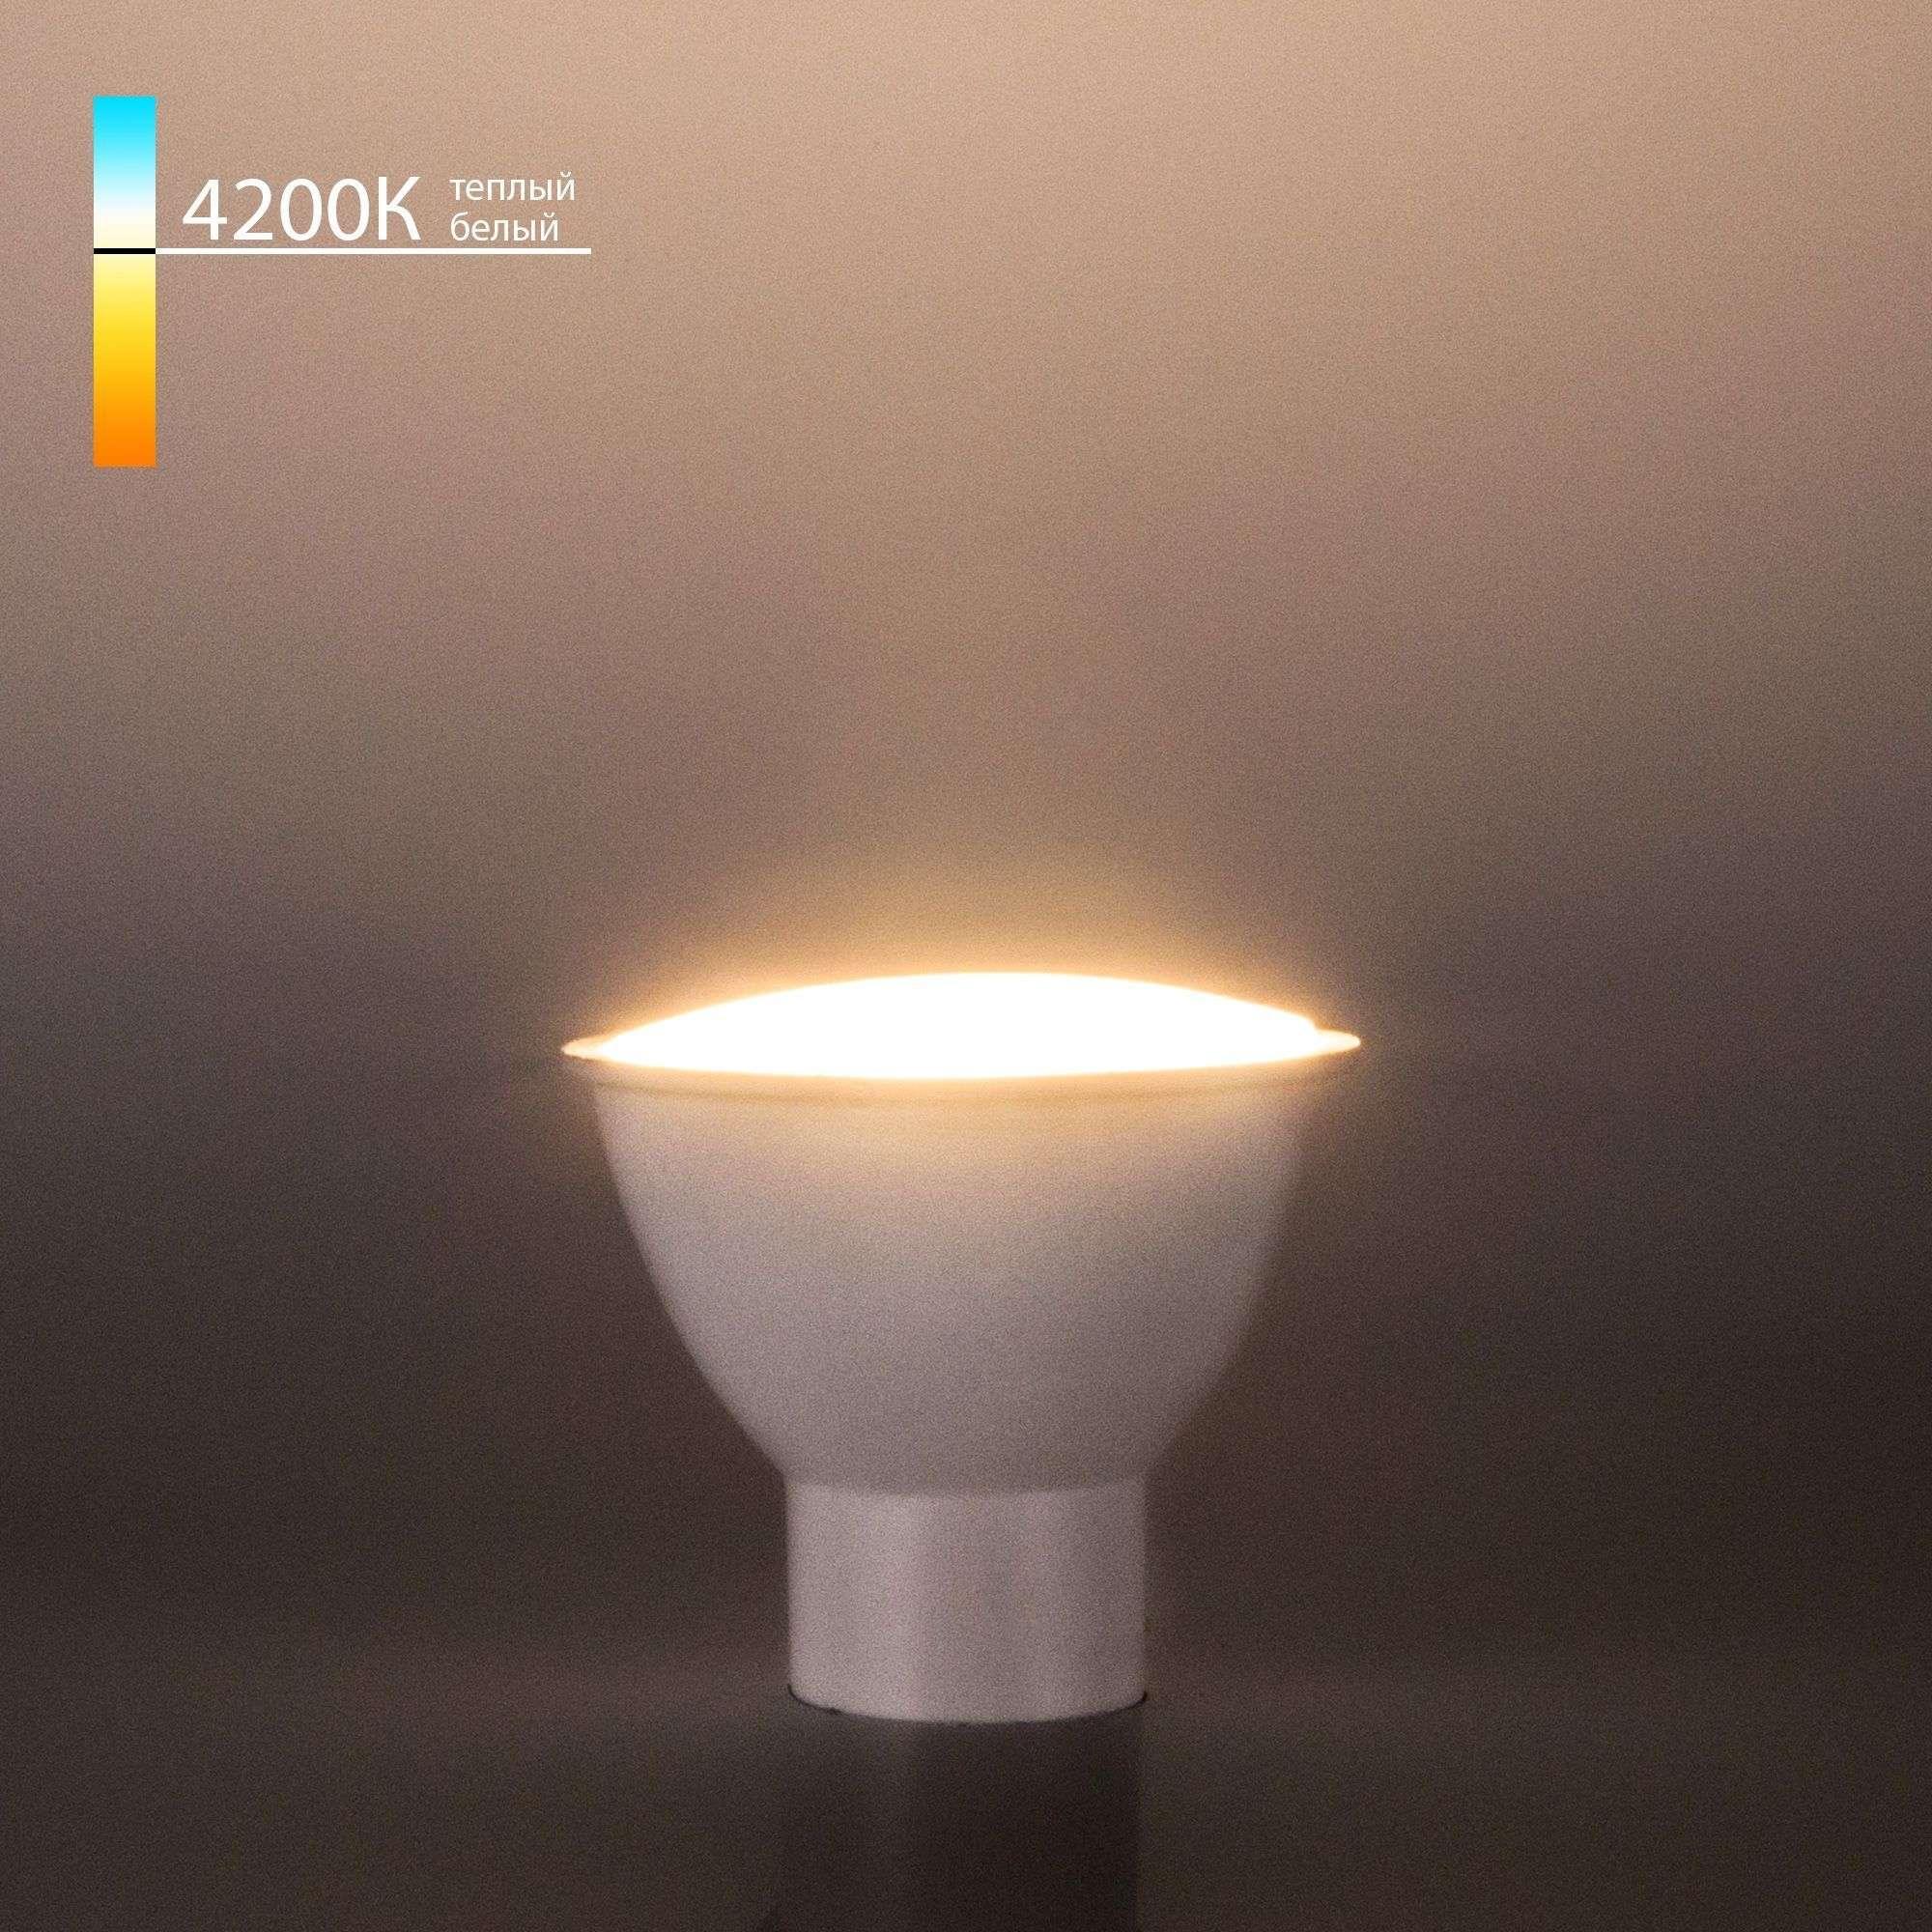 Cветодиодная лампа JCDR 5W 4200K GU10 GU10 LED 5W 4200K